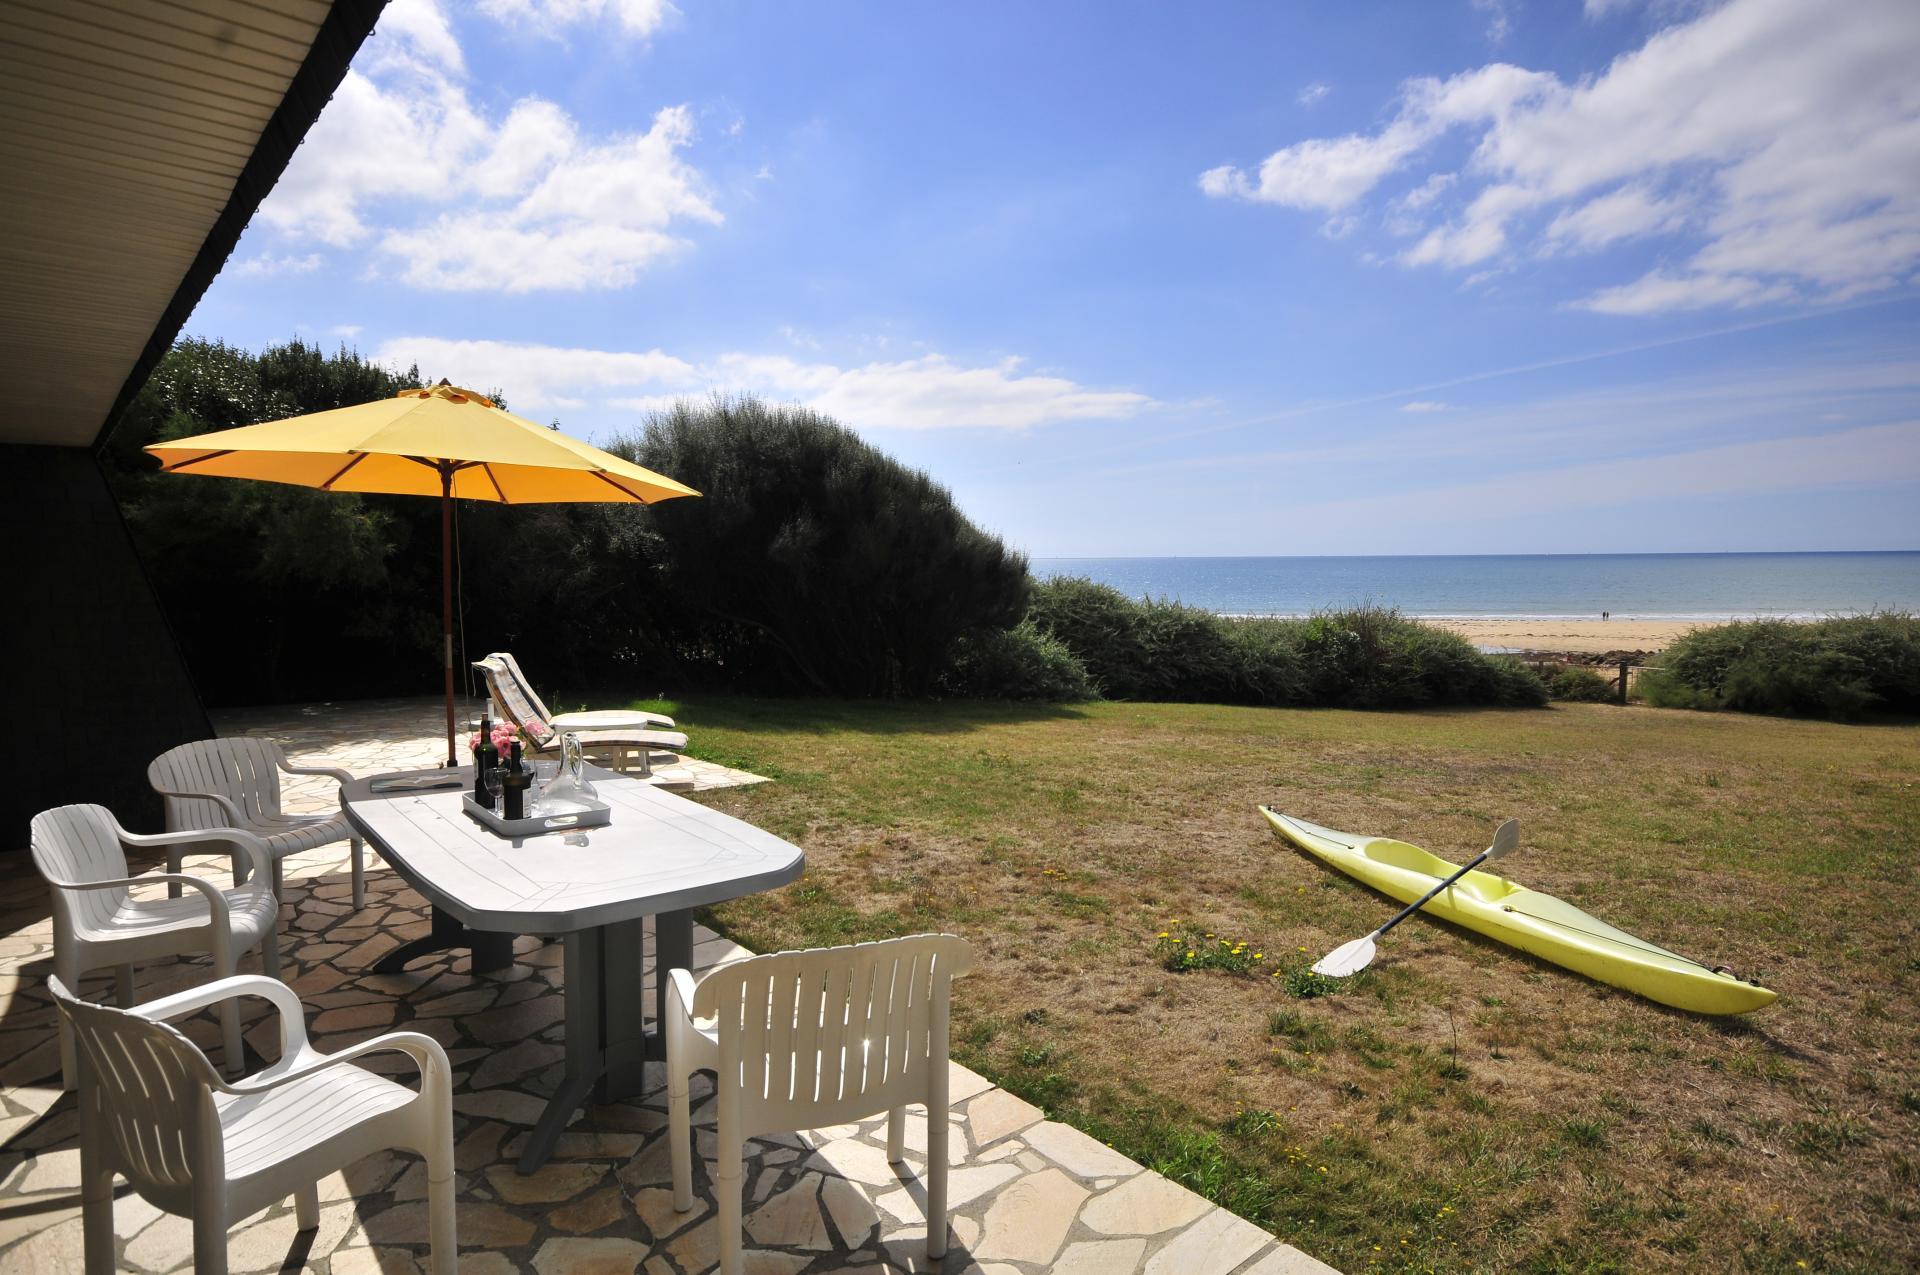 Villa Garden, Cottage on the Beach, Le Pouldu, Brittany.